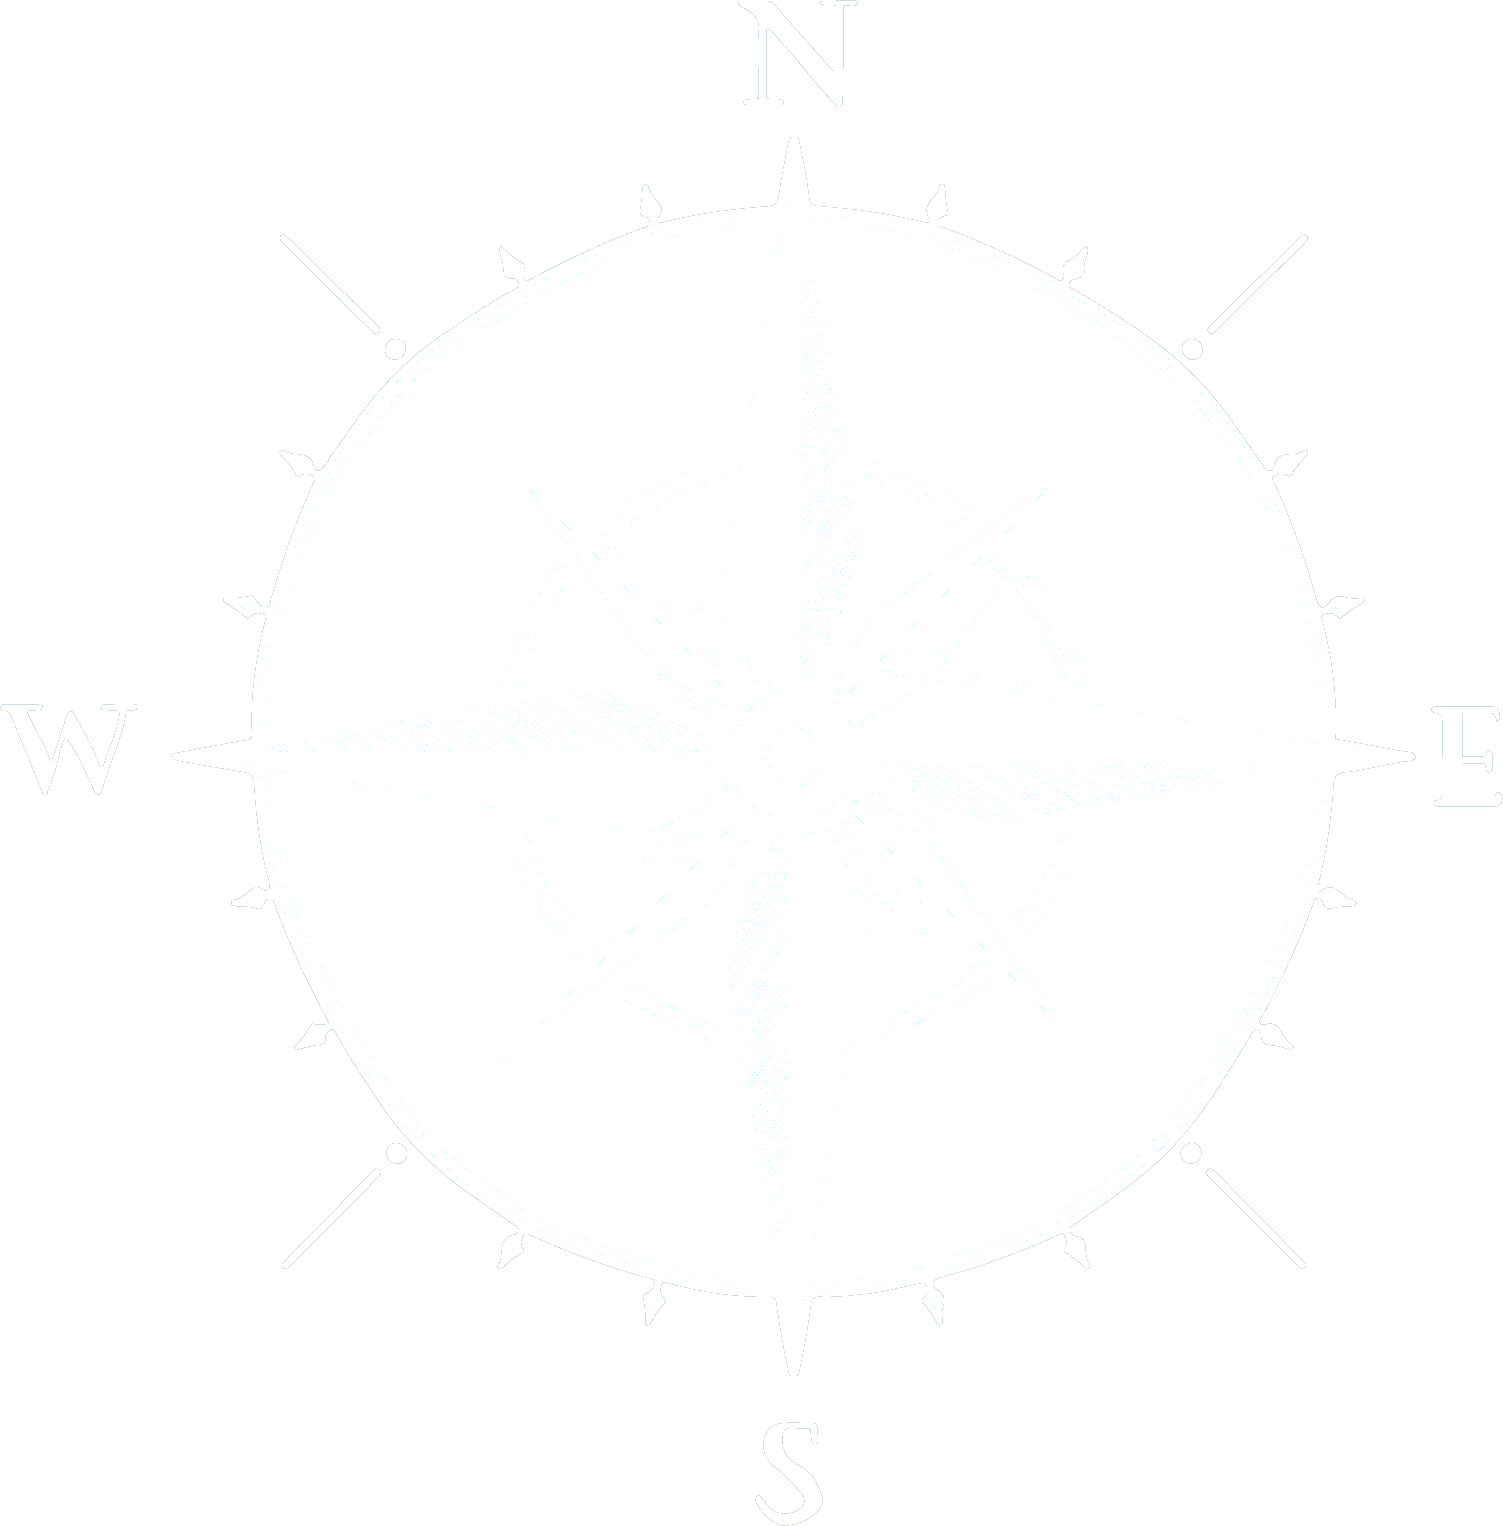 Hand-drawn-vintage-compass2weiss